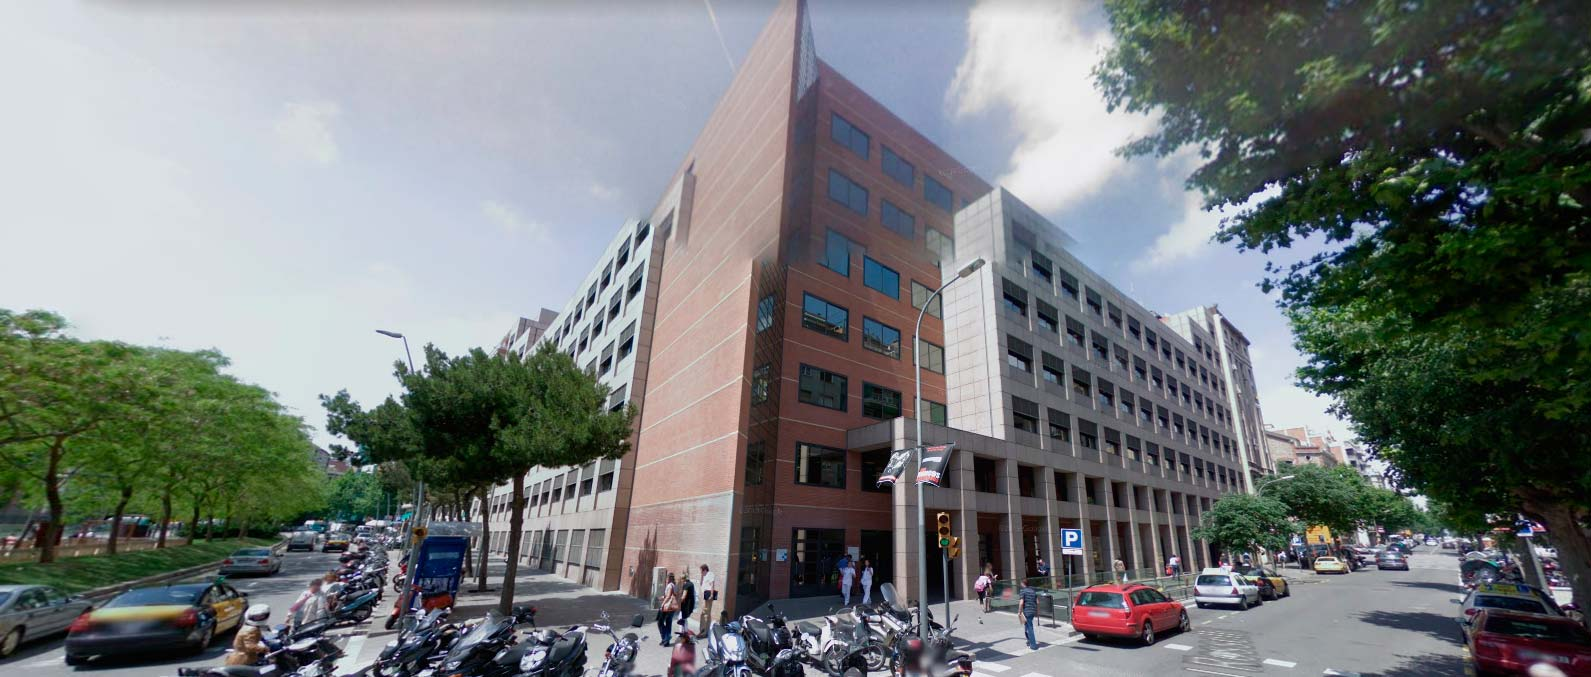 FIVclínic Barcelona